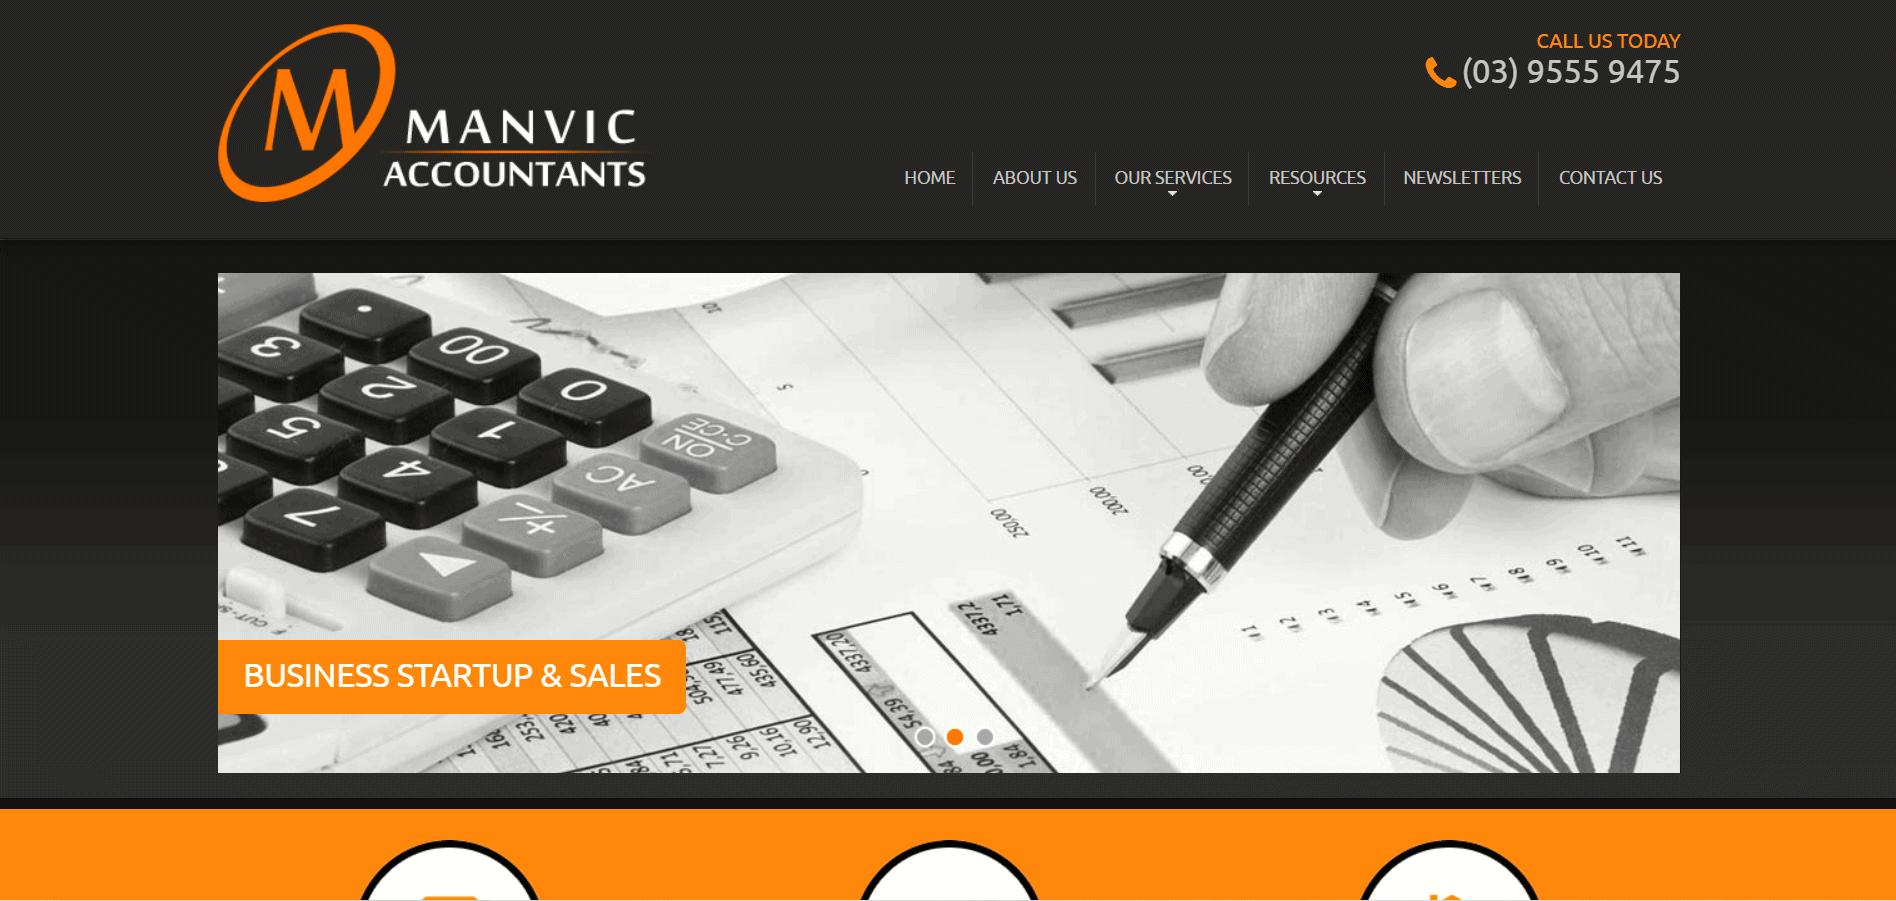 Manvic Accountants